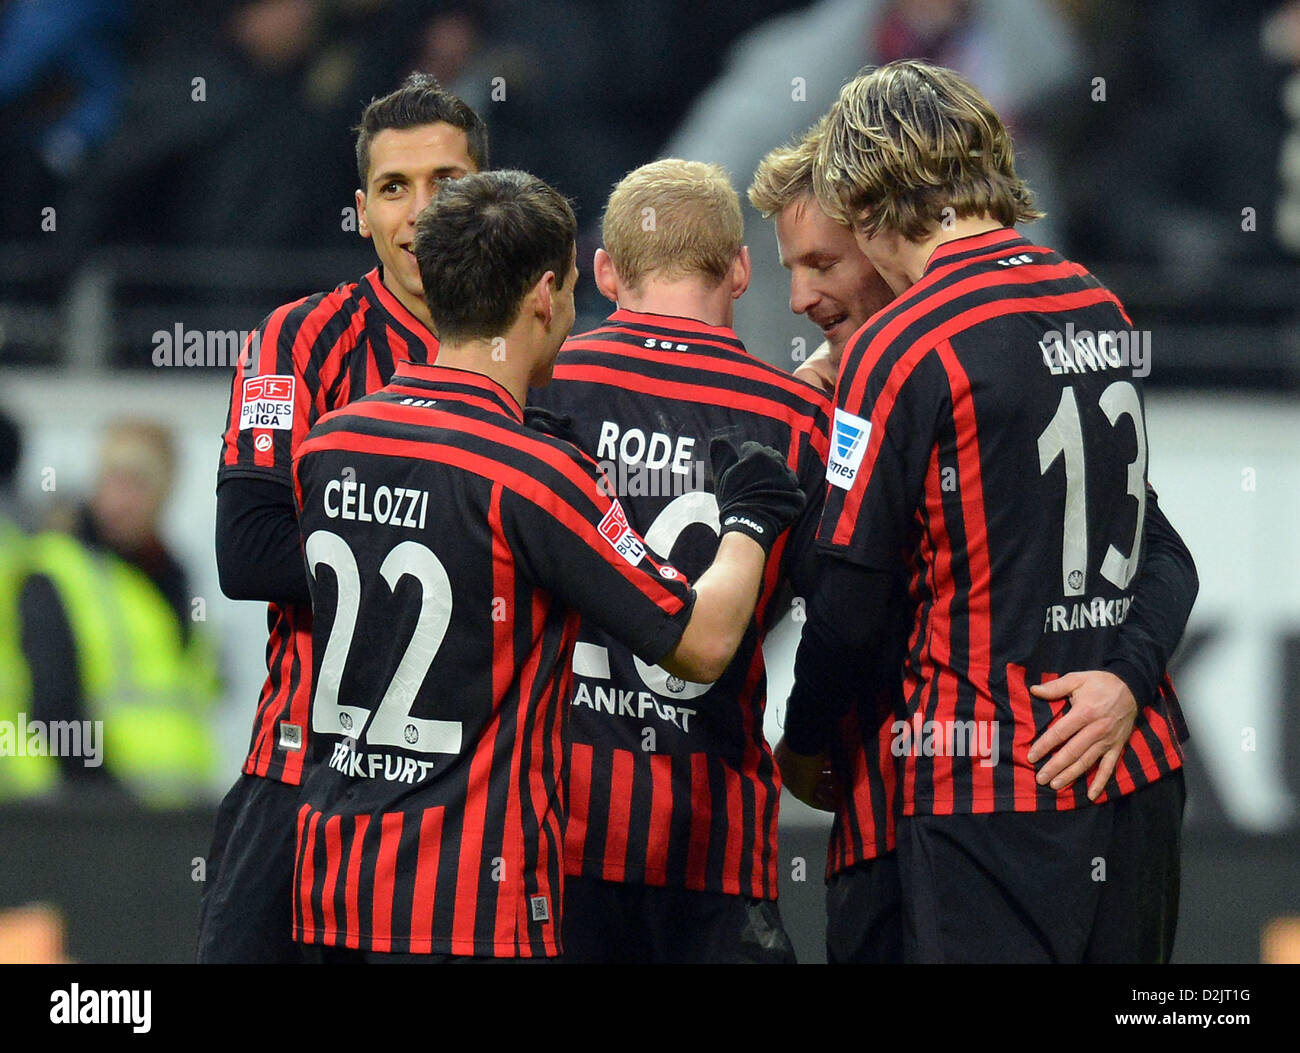 26.01.2013,xjhx, 1.Bundesliga, Eintracht Frankfurt - TSG 1899 Hoffenheim, v.l. Stefan Aigner (Eintracht Frankfurt) - Stock Image